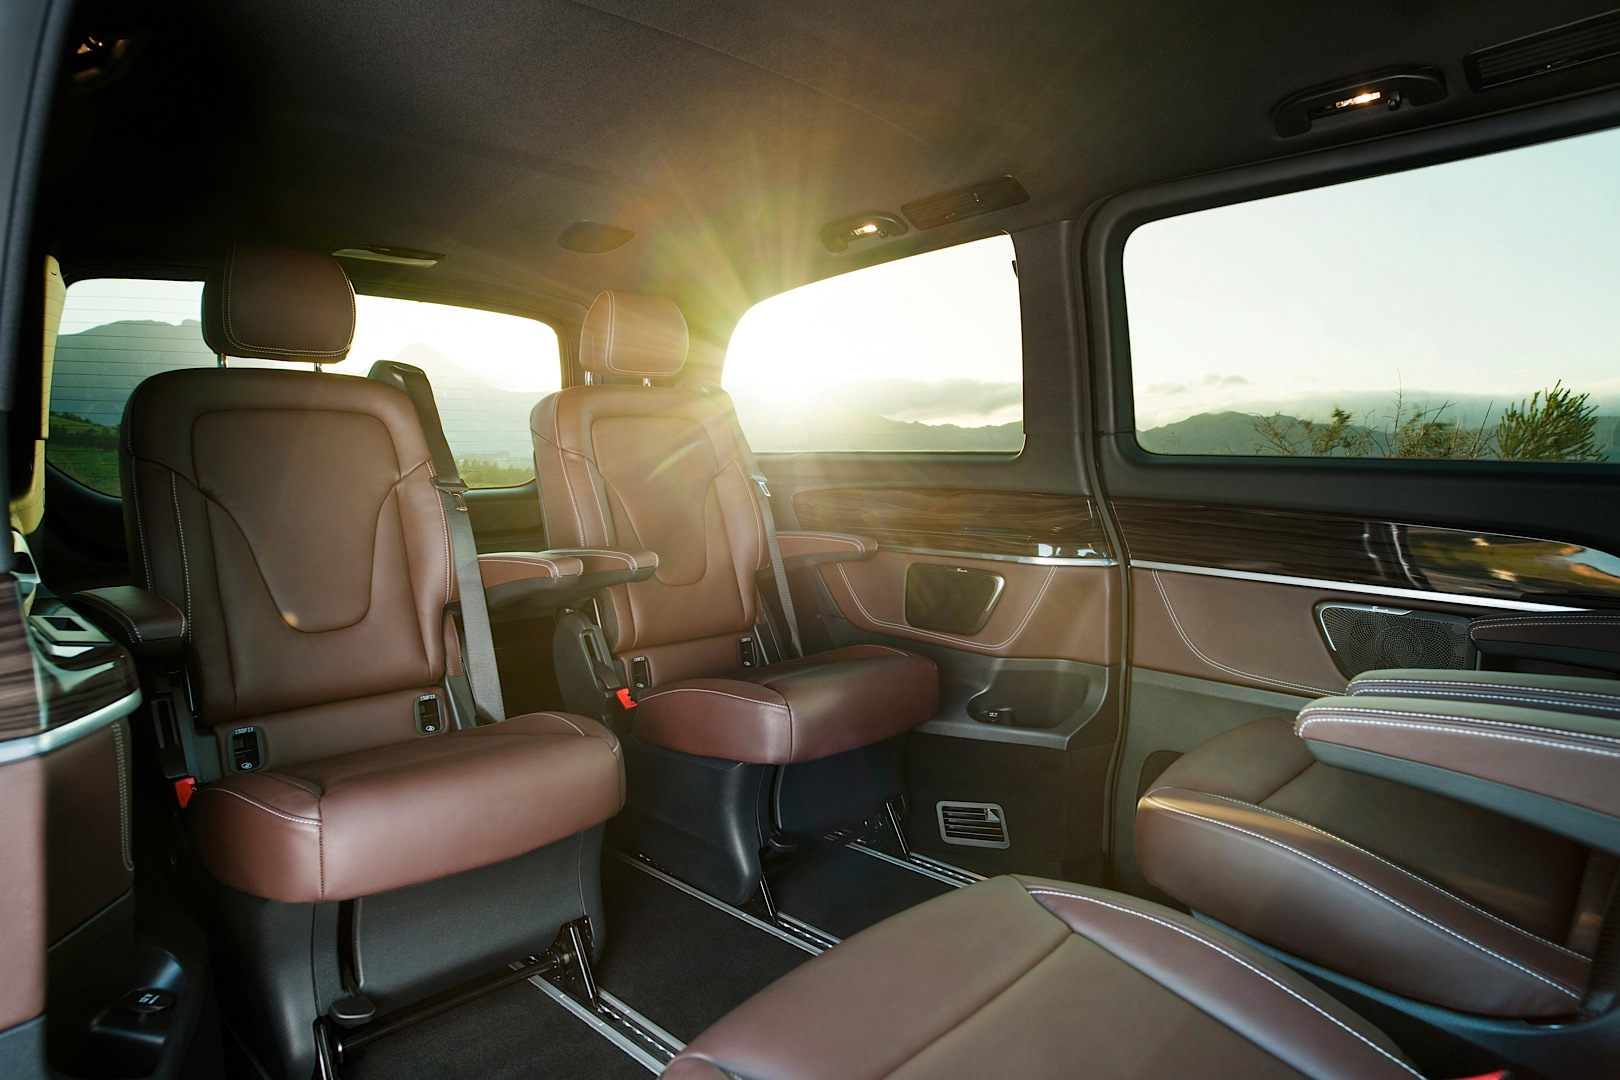 mercedes benz officially reveals 2015 v class autoevolution. Black Bedroom Furniture Sets. Home Design Ideas